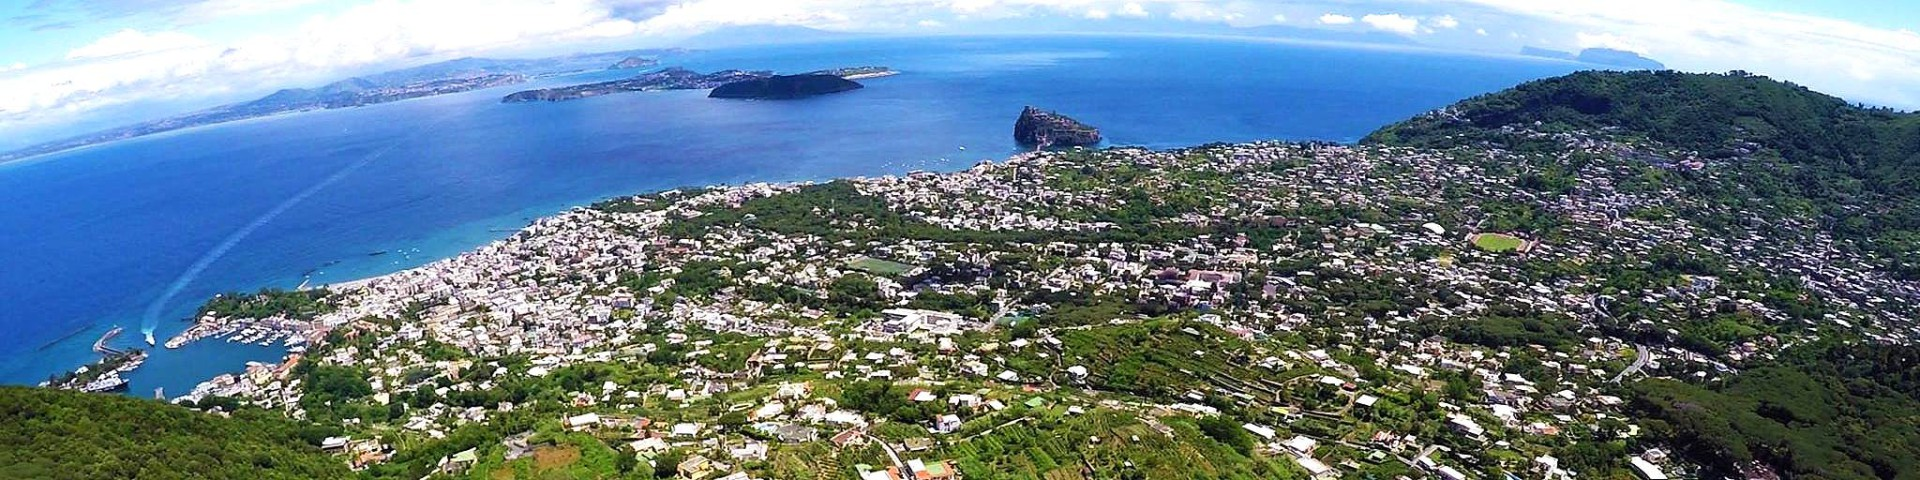 Ischia, naproti ostrov Procida a vpravo vzadu ostrov Capri (autor: Luigi Conte)